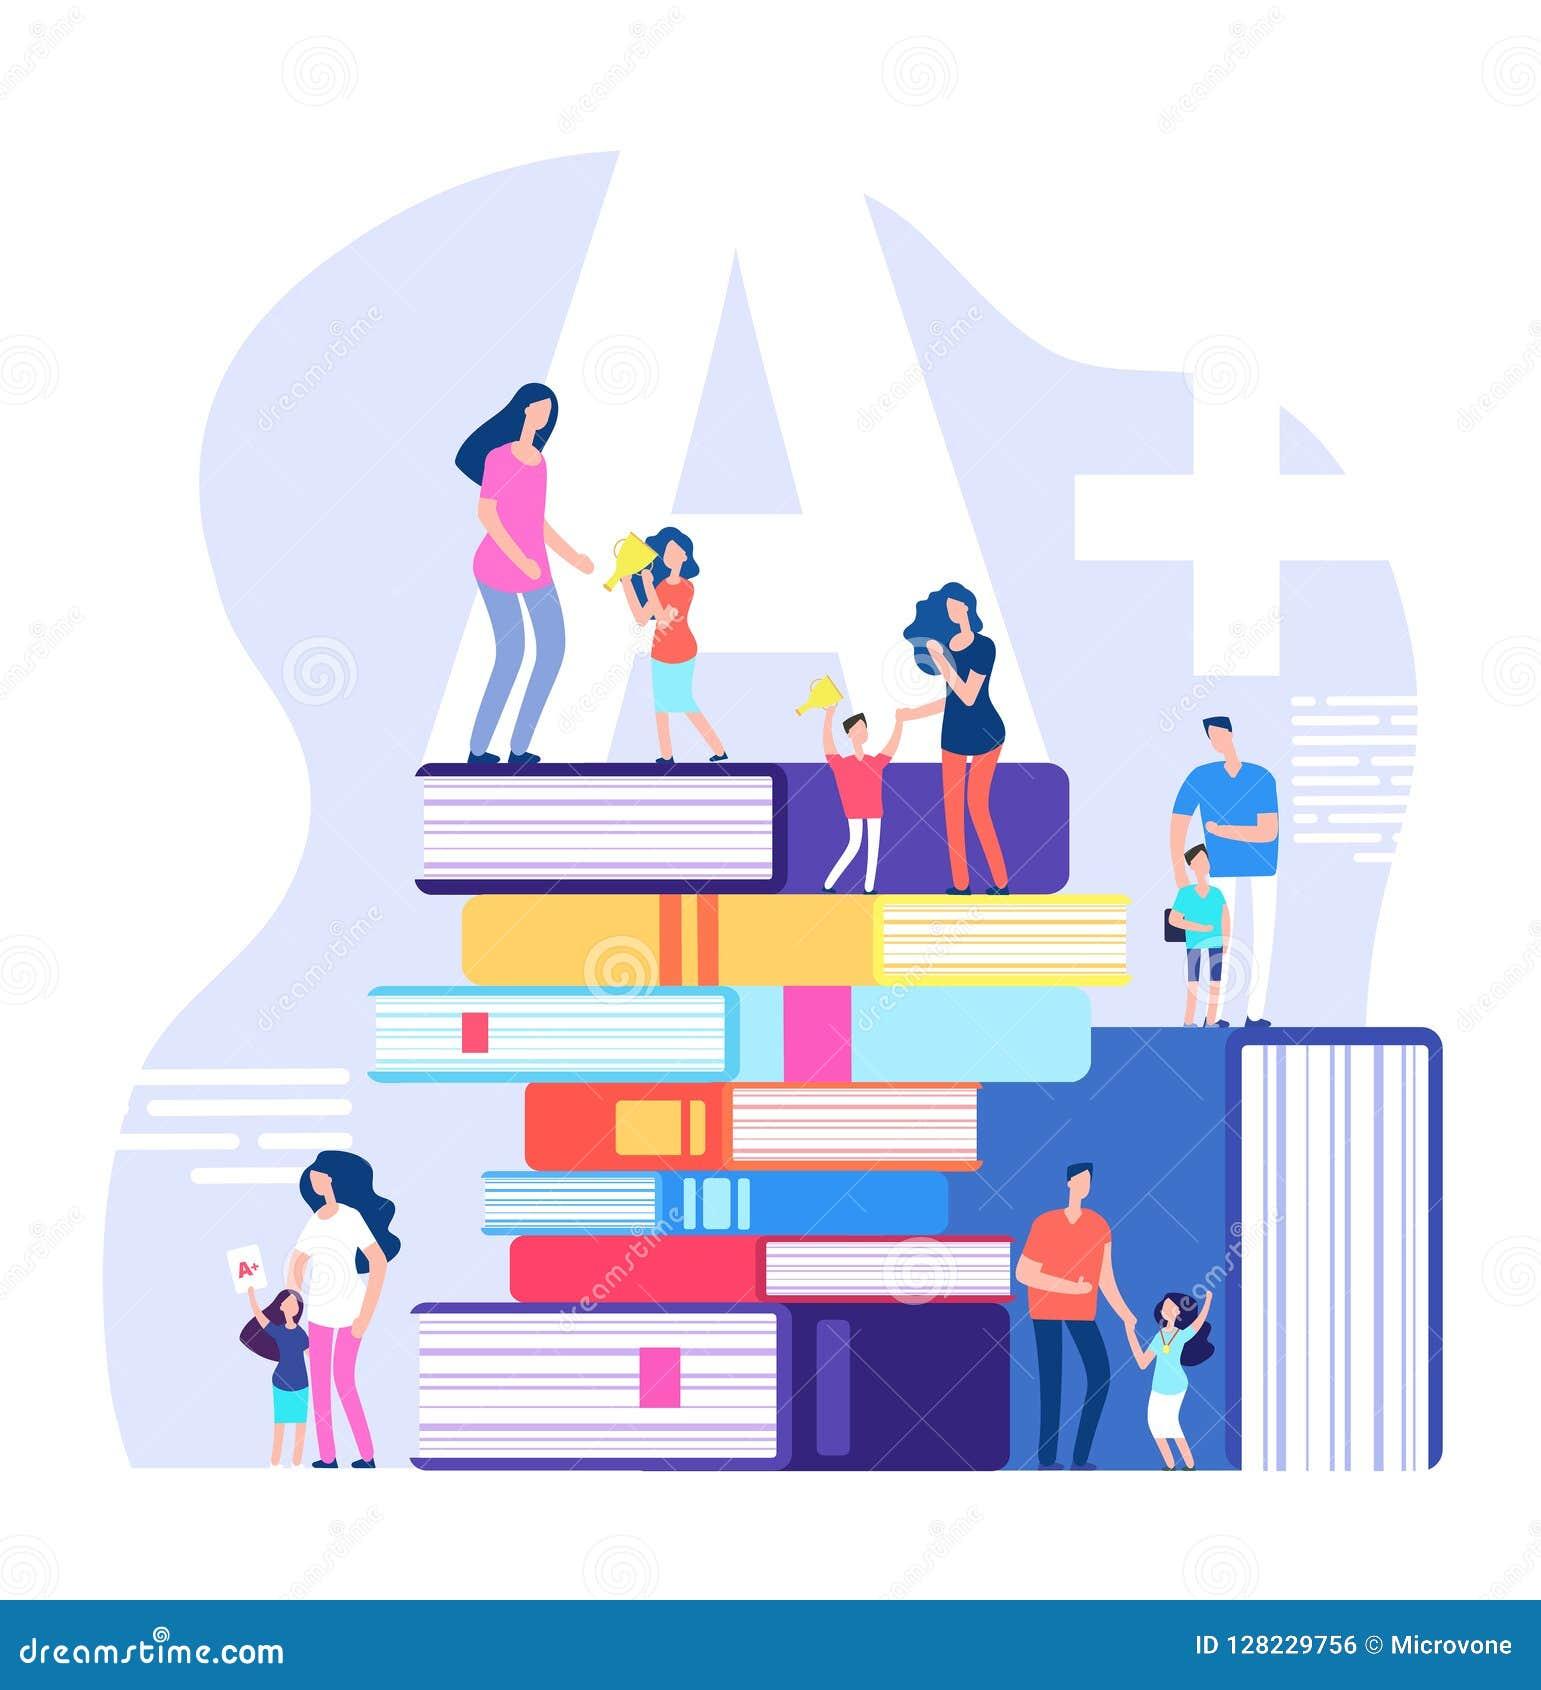 Kids learning concept. Excellent pupils, praising parents and teachers with huge books. Children school education vector